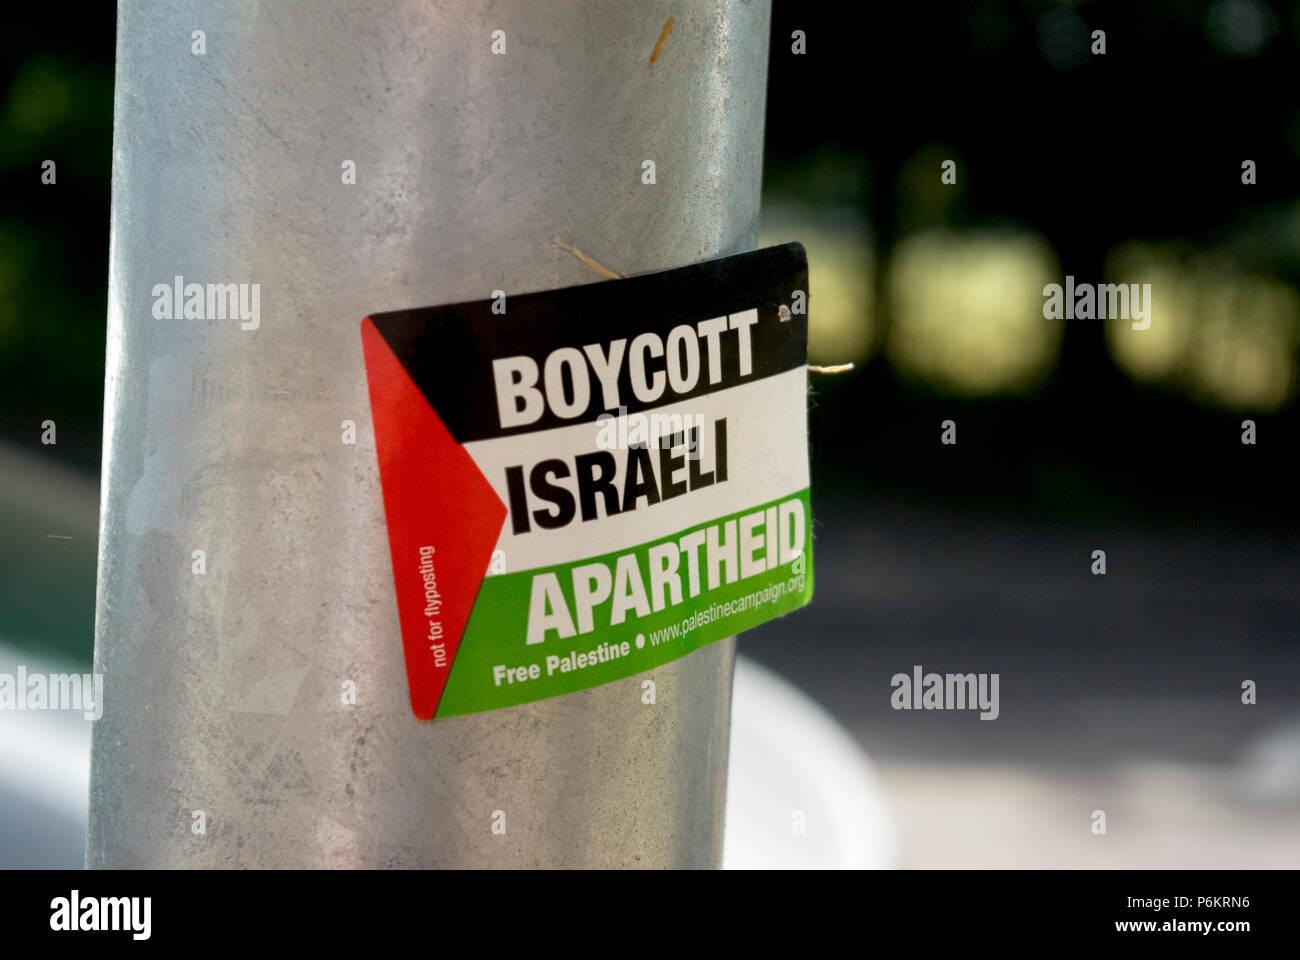 Boycott Israel Sticker - Stock Image